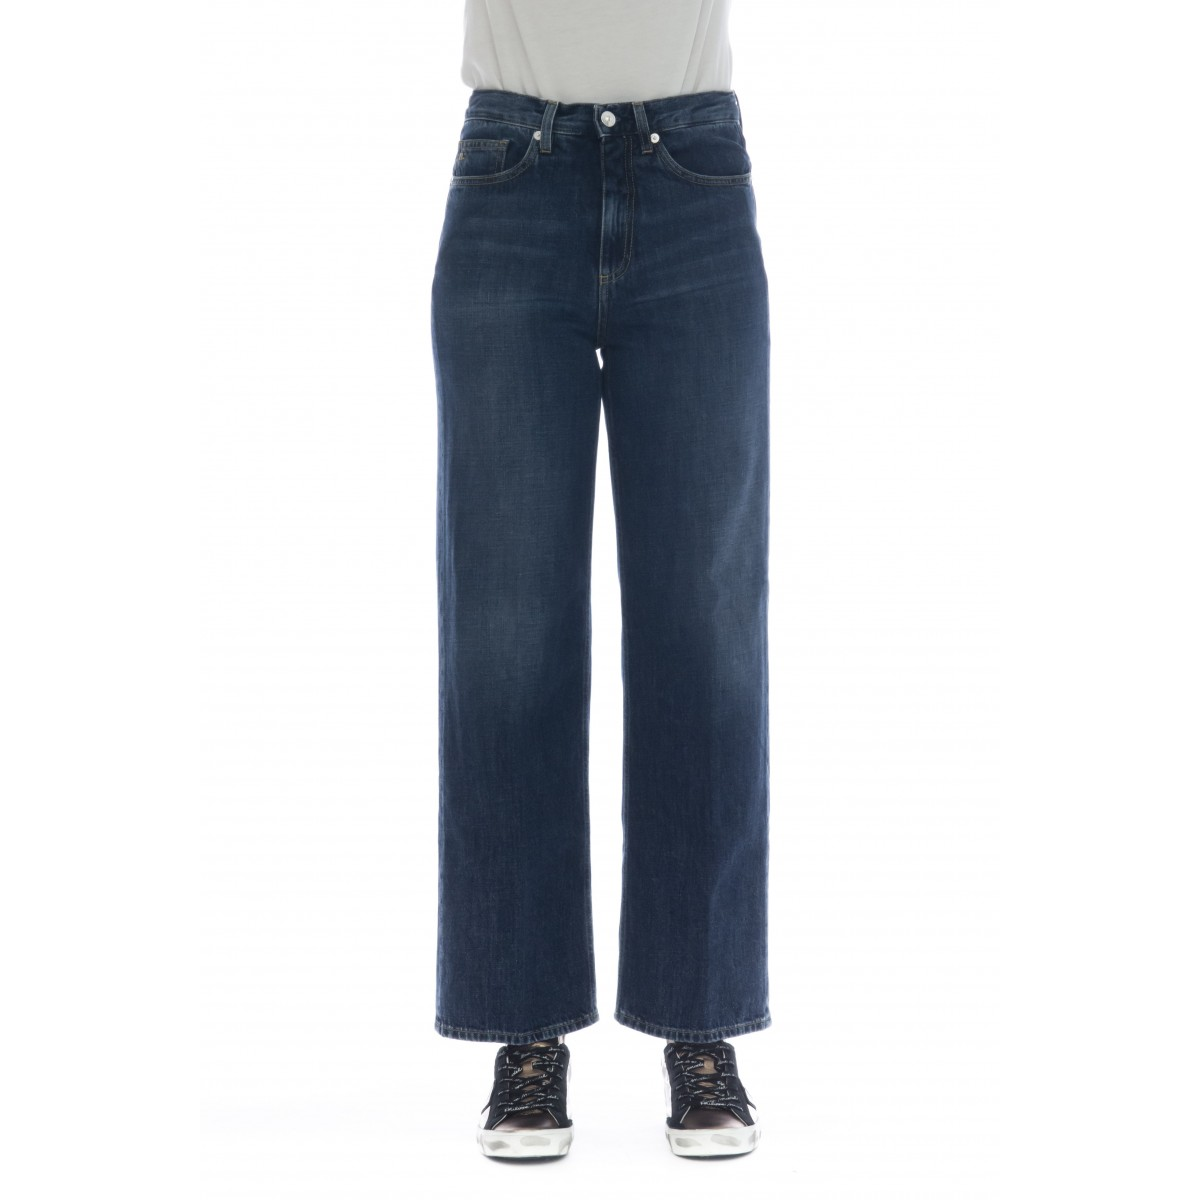 Jeans - Elsa ls03 jeans palazzo